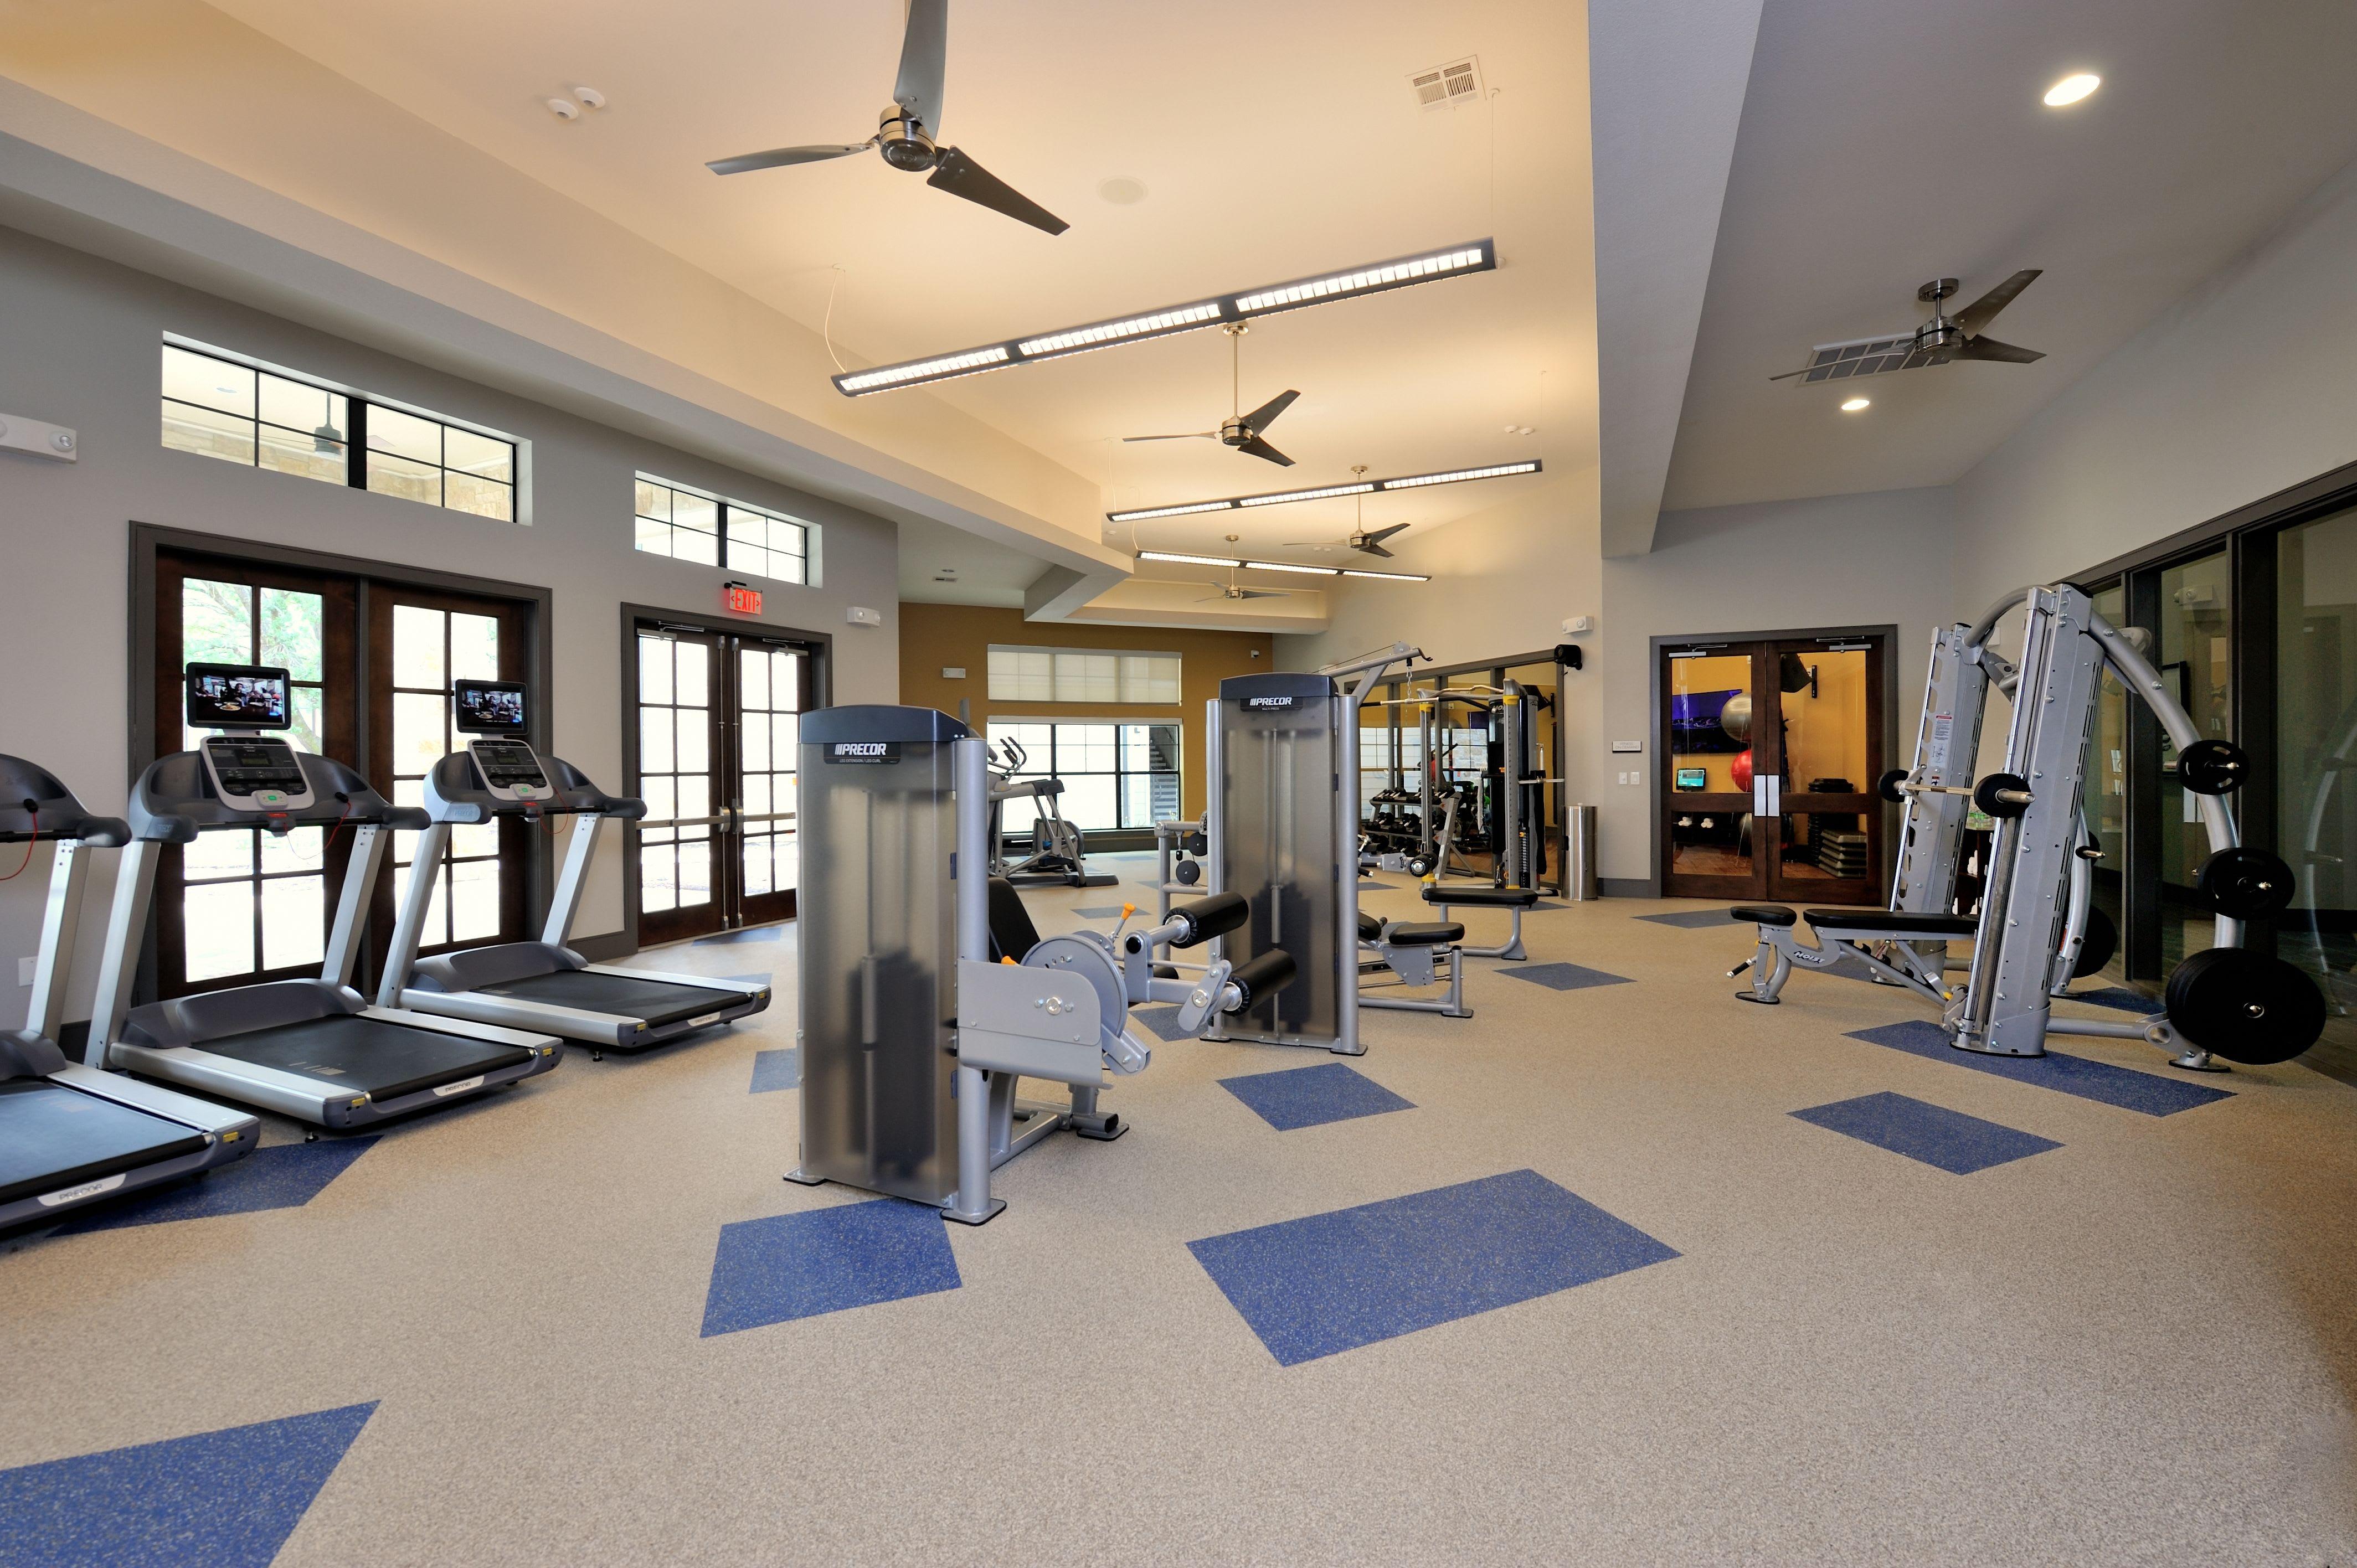 Fitness room at Olympus Falcon Landing in Katy, TX